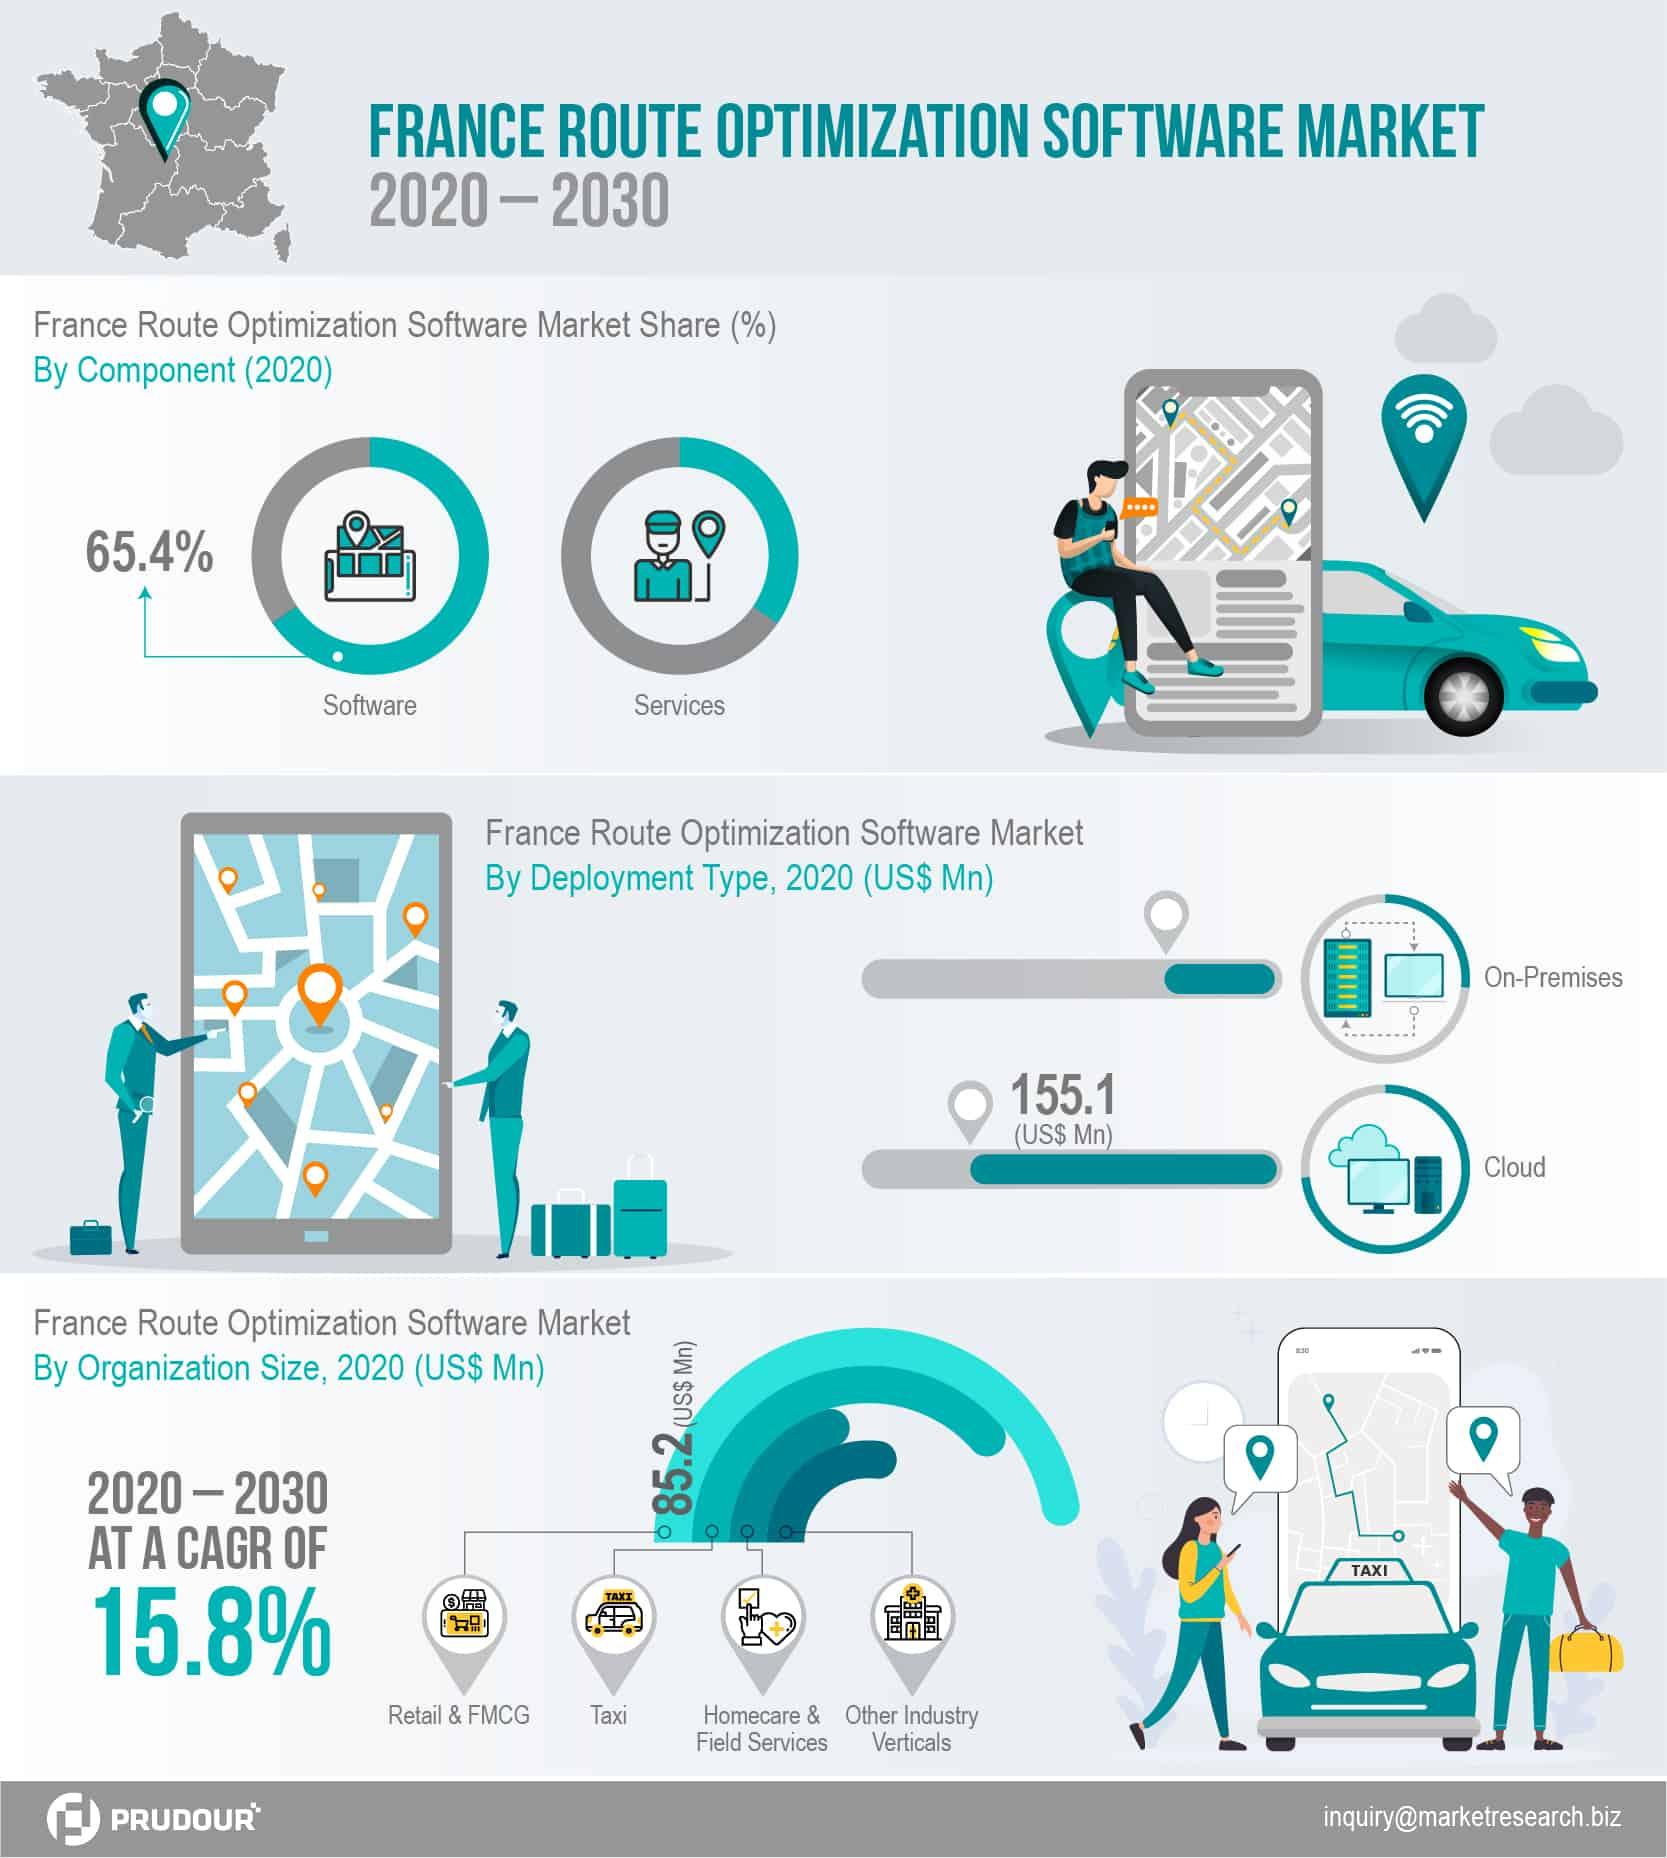 France Route Optimization Software Market